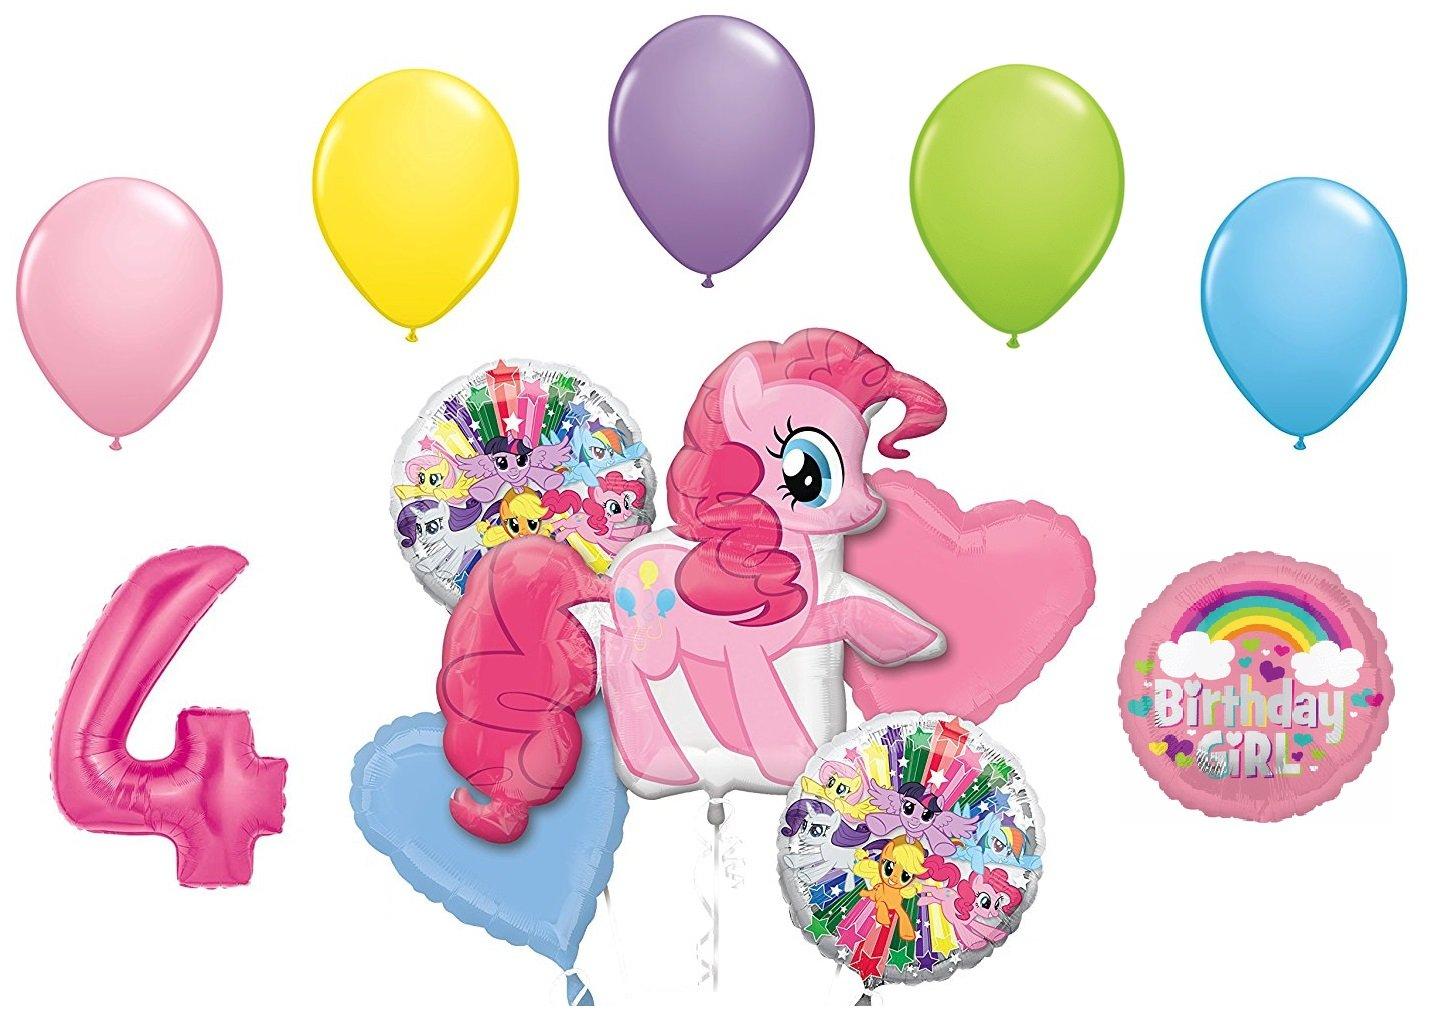 Amazon My Little Pony Pinkie Pie And Rainbow Dash 4th Birthday Party Supplies 12 Piece Mylar Latex Balloons Set Balloon Toys